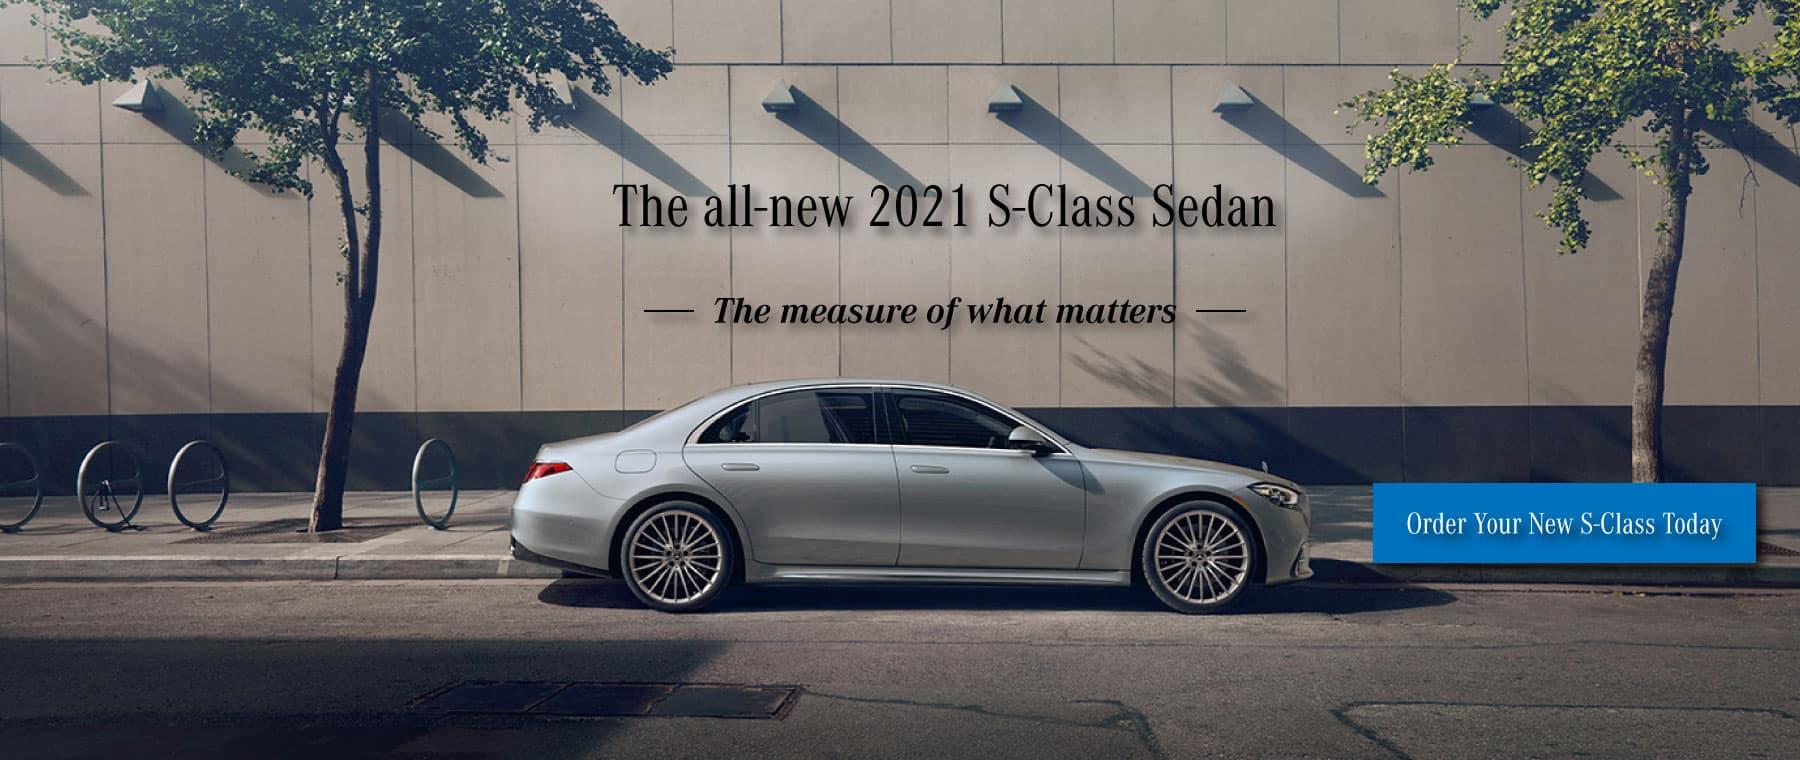 Mercedes-Benz of West Chester 2021 S-Class Sedan